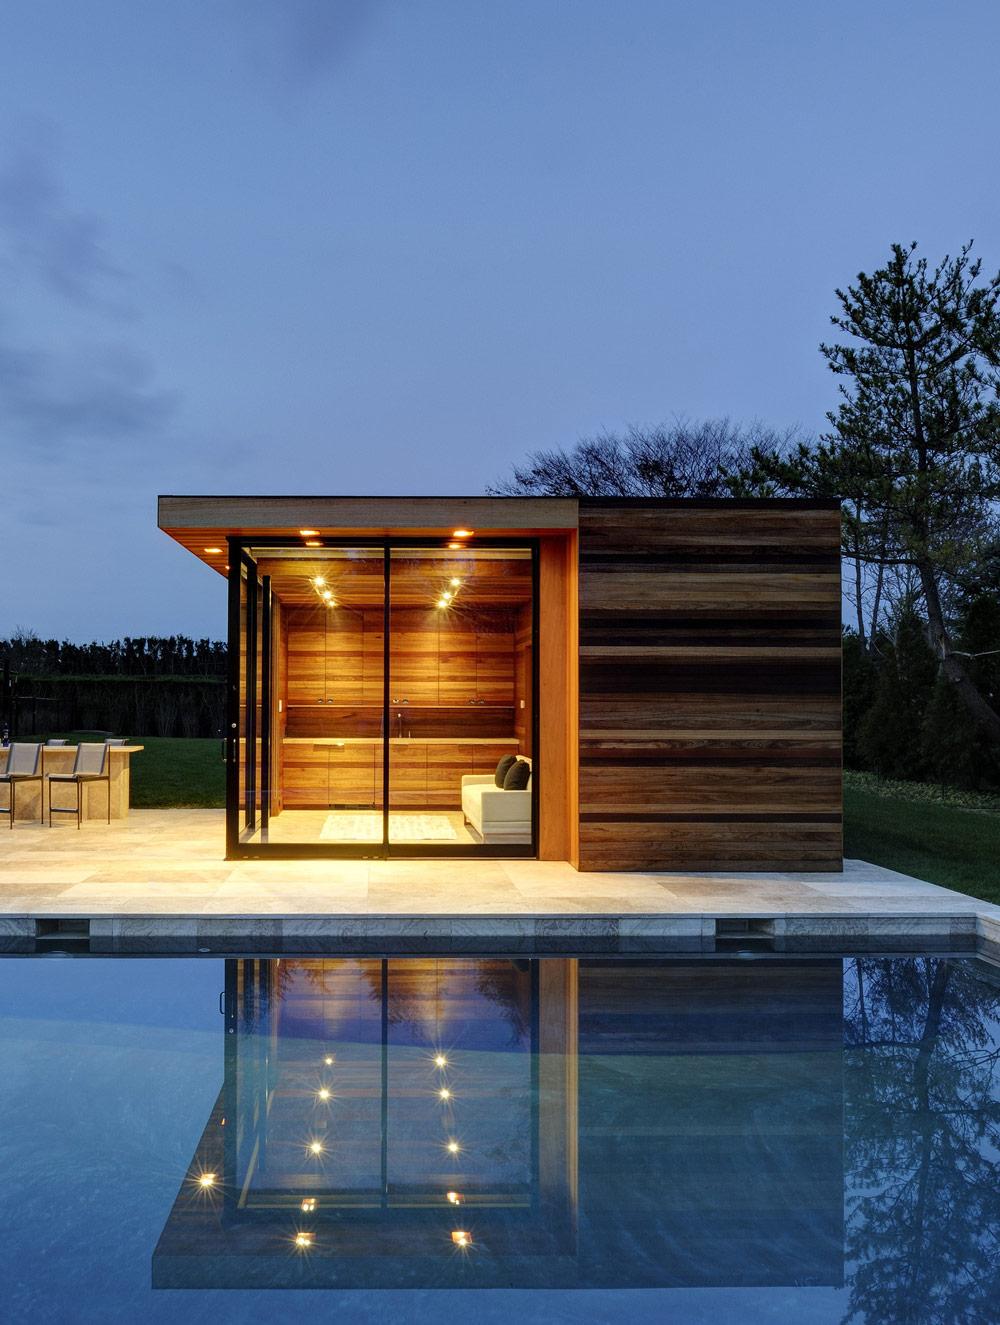 Pool House, Sam's Creek in Bridgehampton, New York by Bates Masi Architects